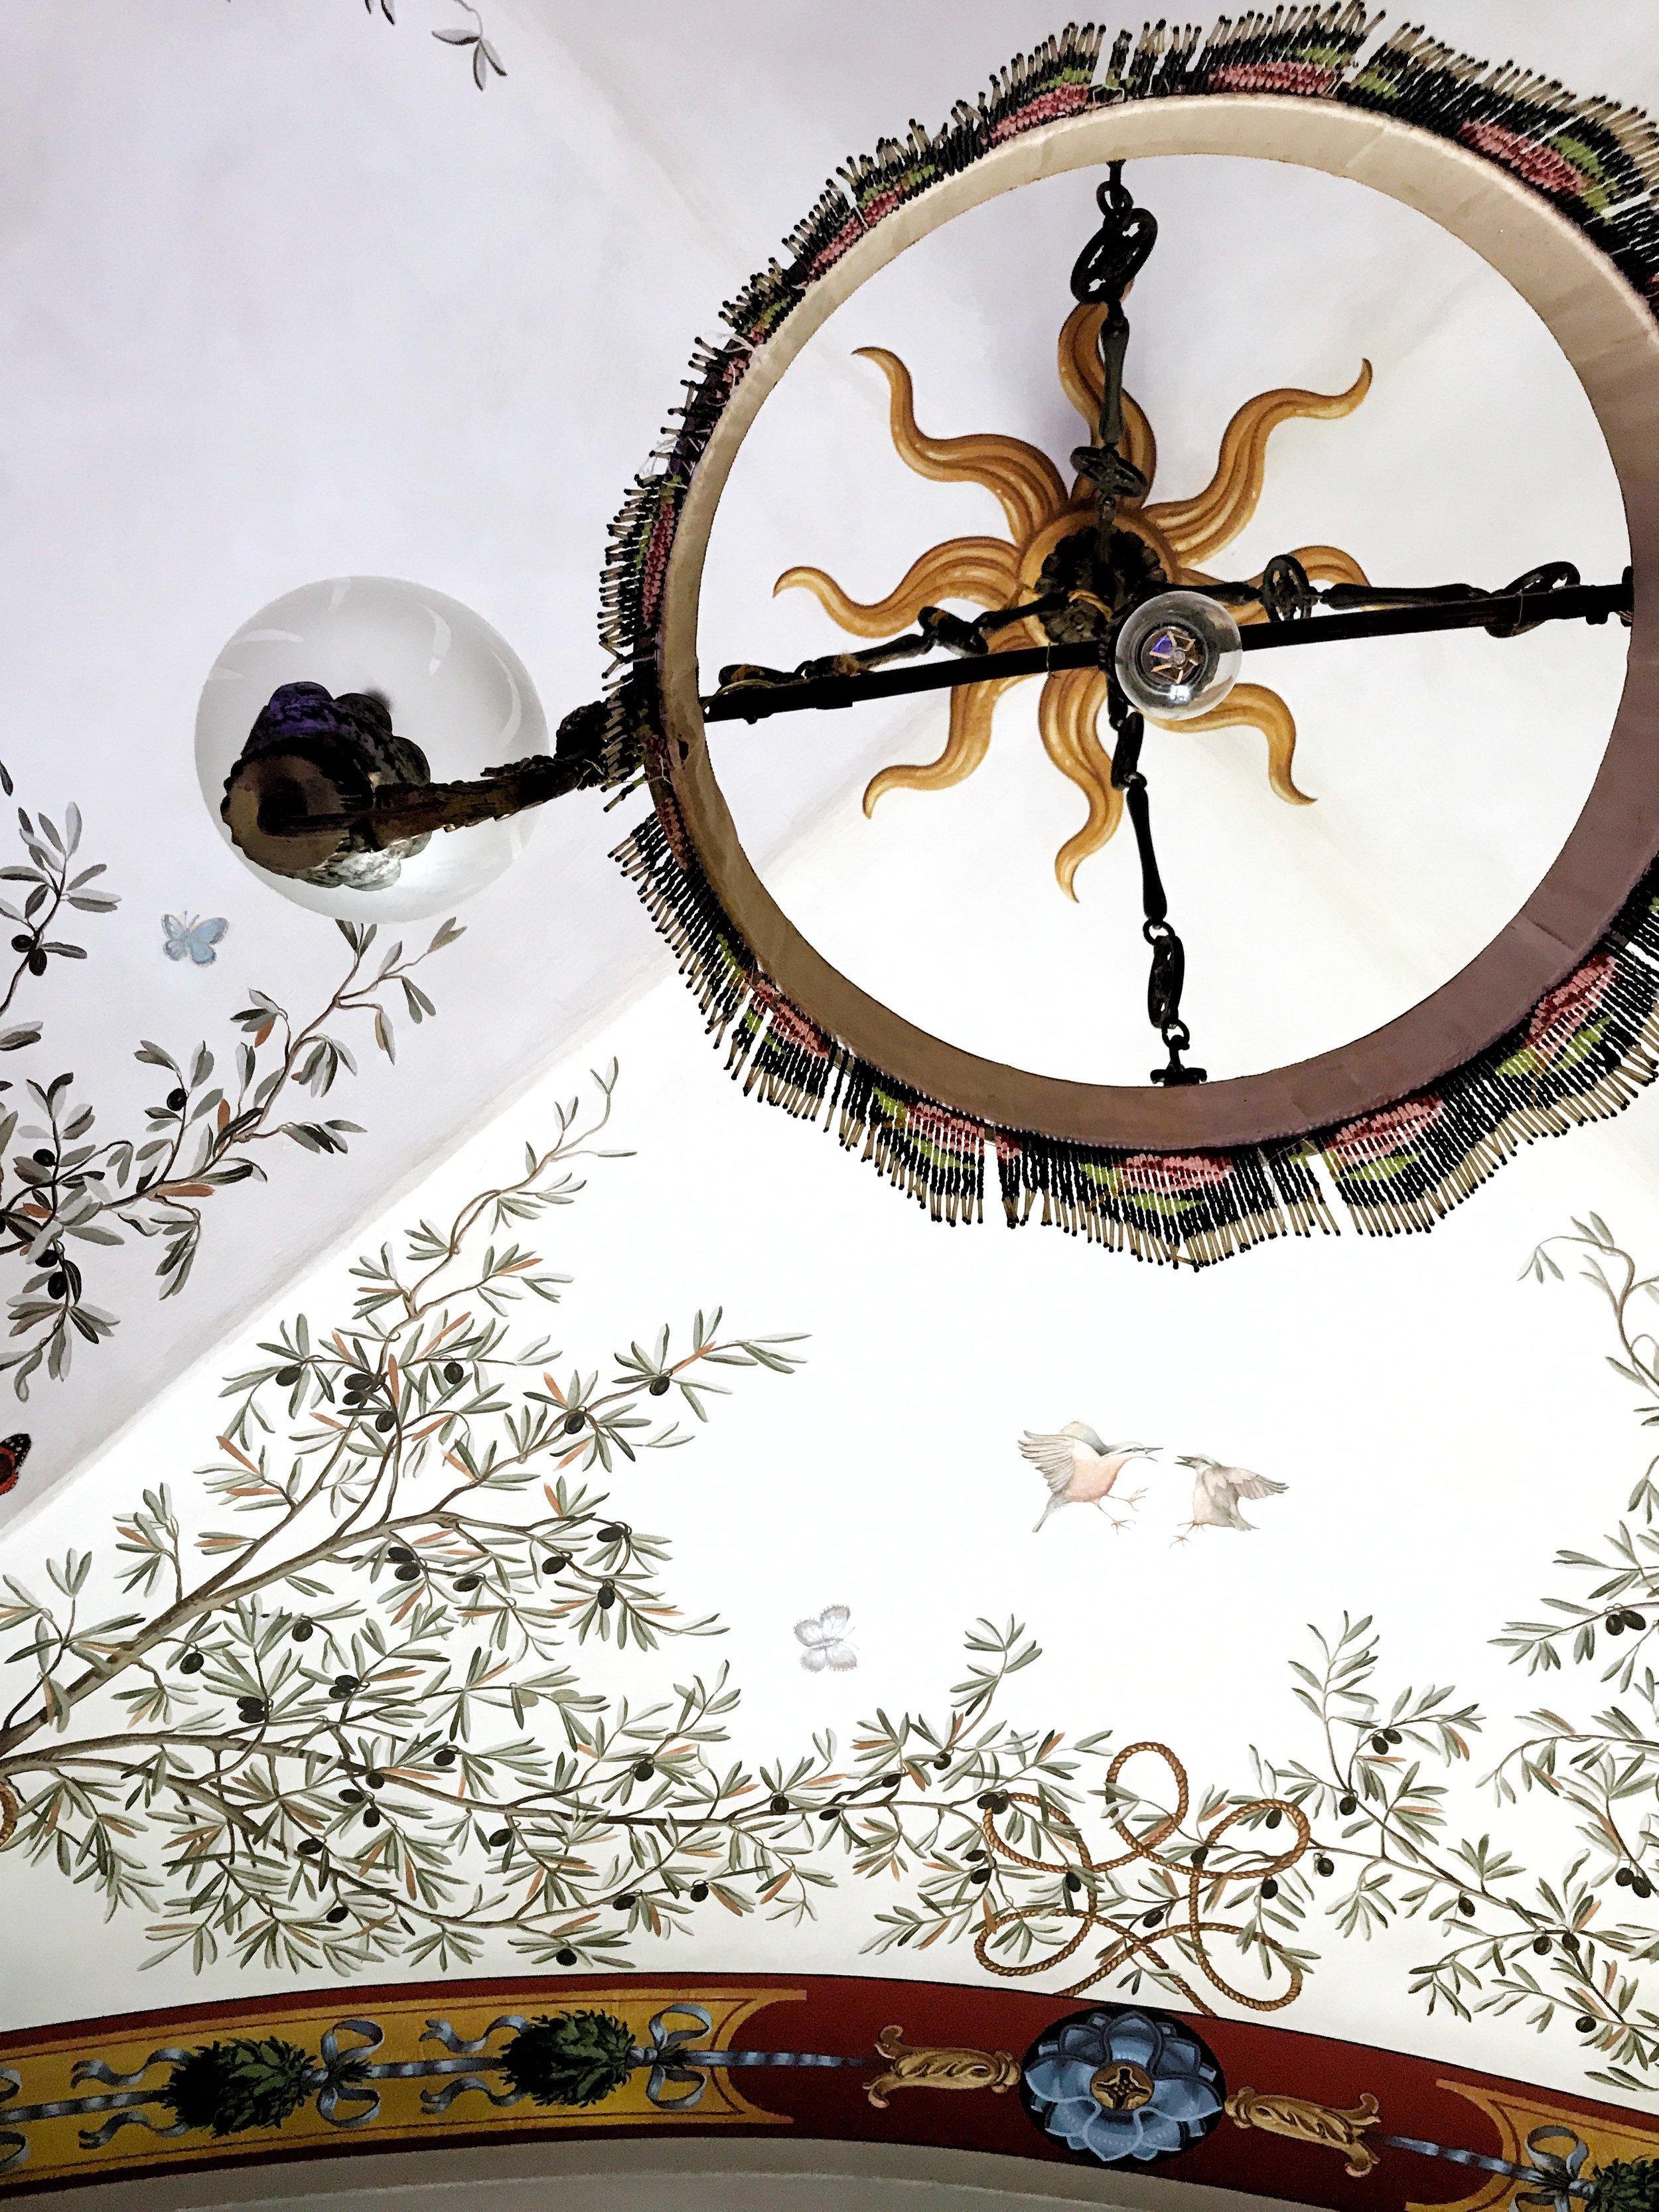 Ceiling in Relais degli Angeli hotel in Siena, Italy